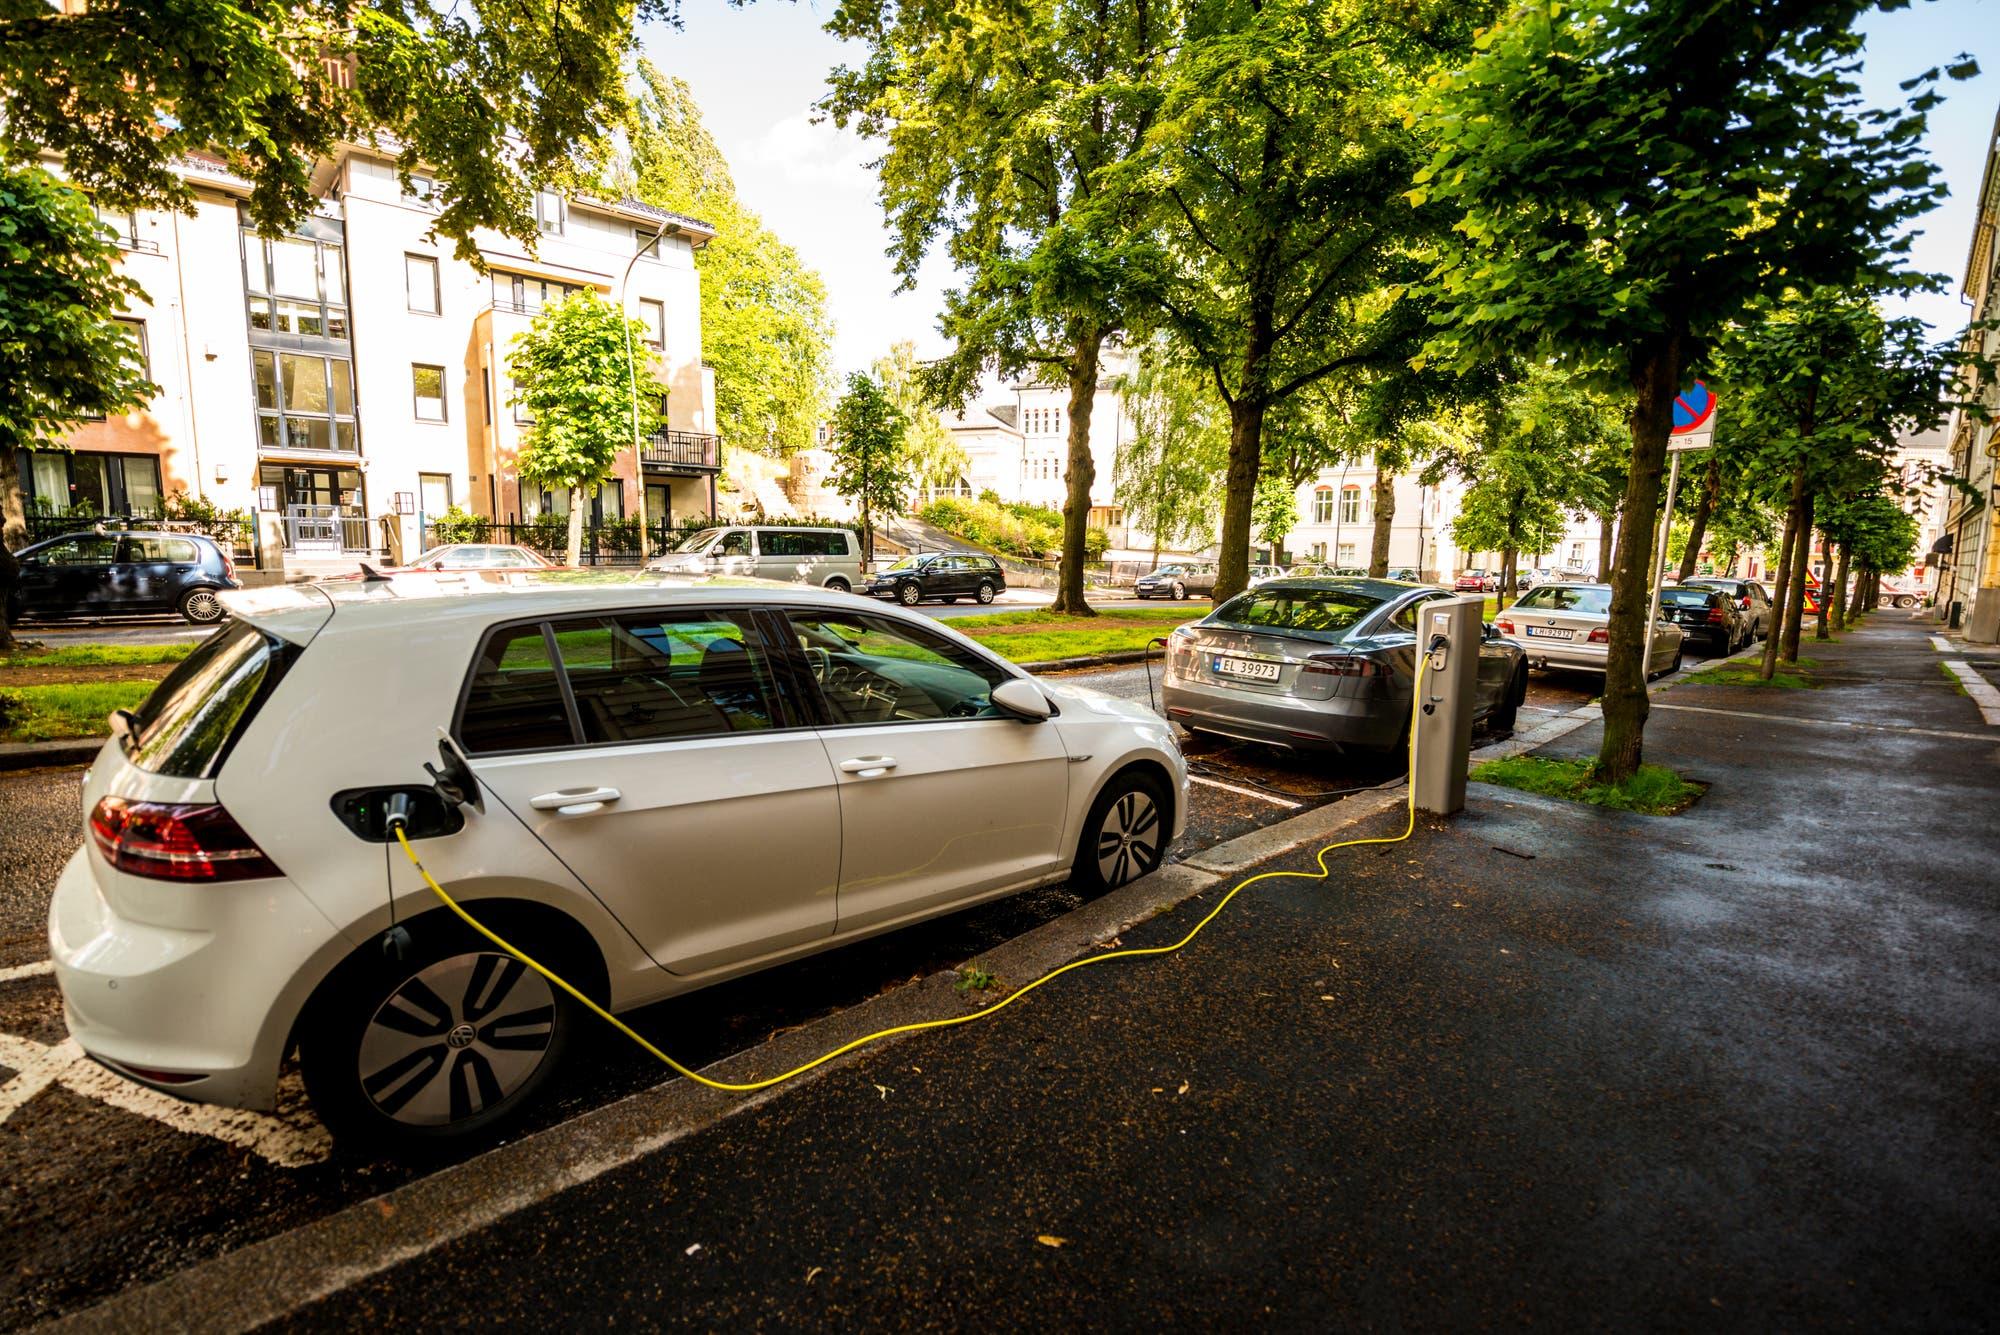 Elektroauto am Straßenrand in Oslo